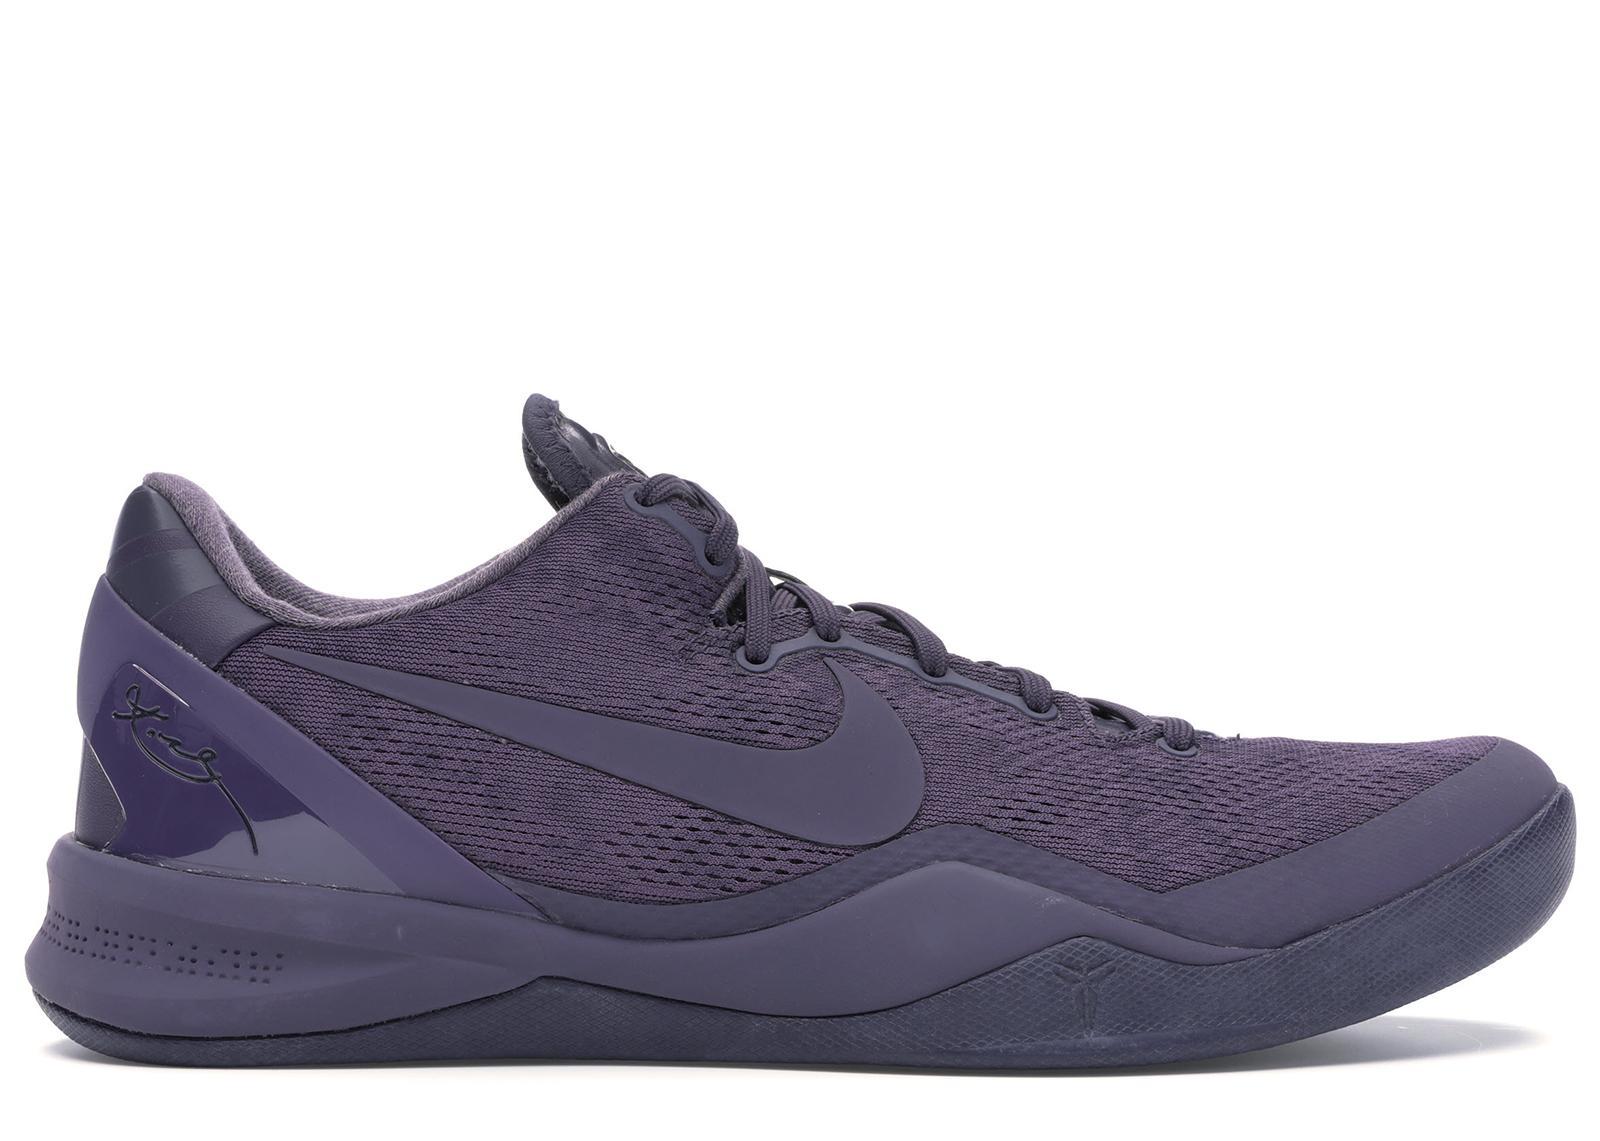 Nike Kobe 8 Ftb 'fade To Black' Shoes